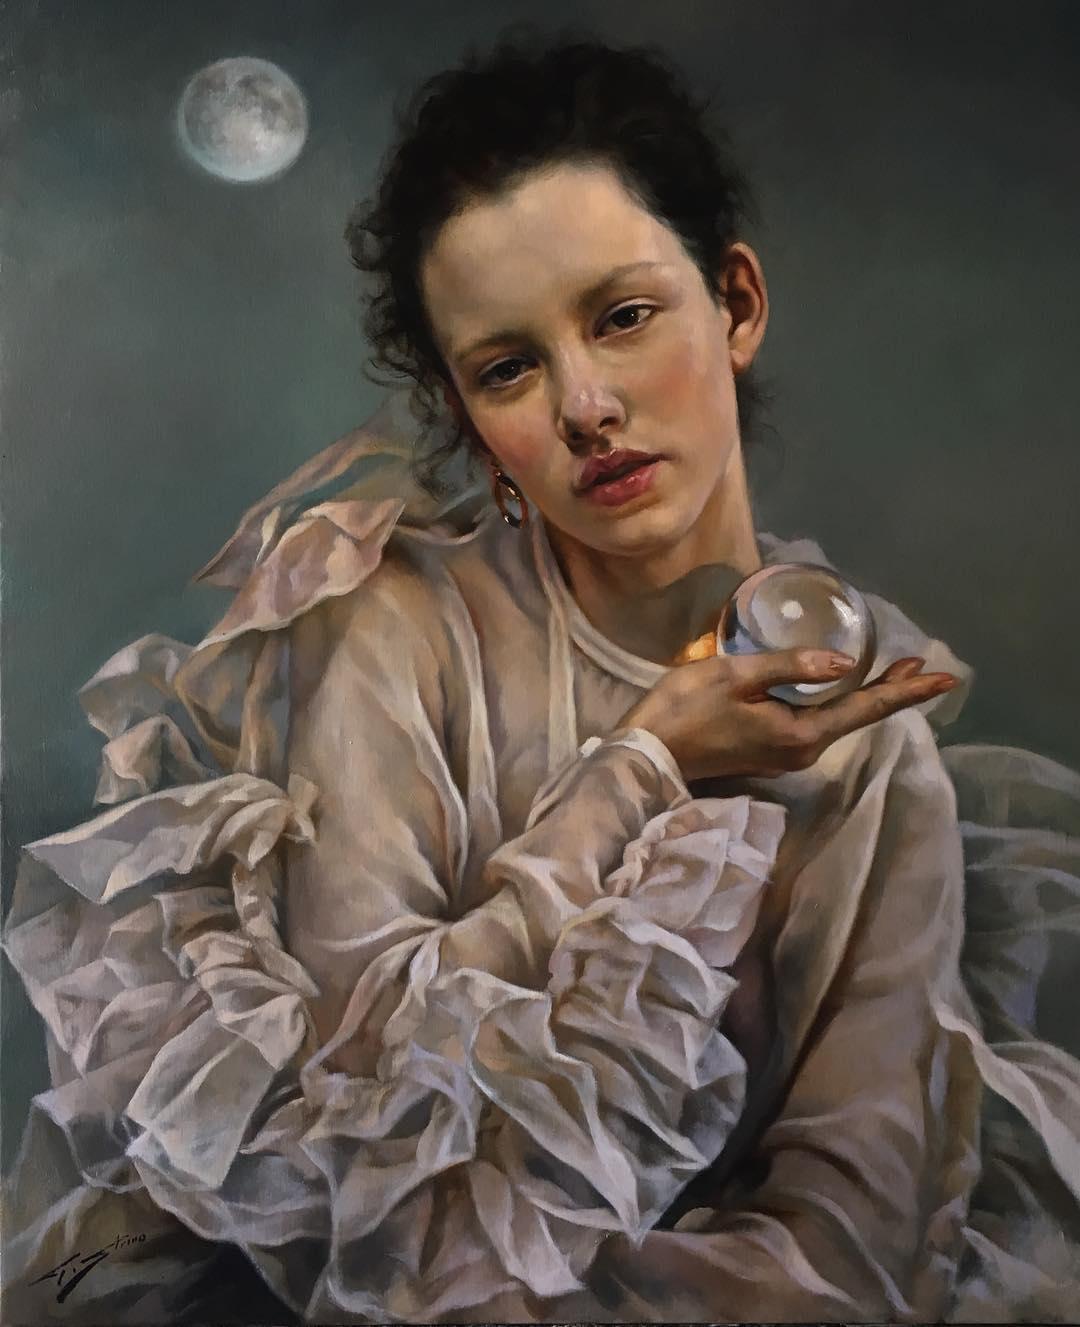 Картины художника Gianni Strino. Фигуративный реализм.